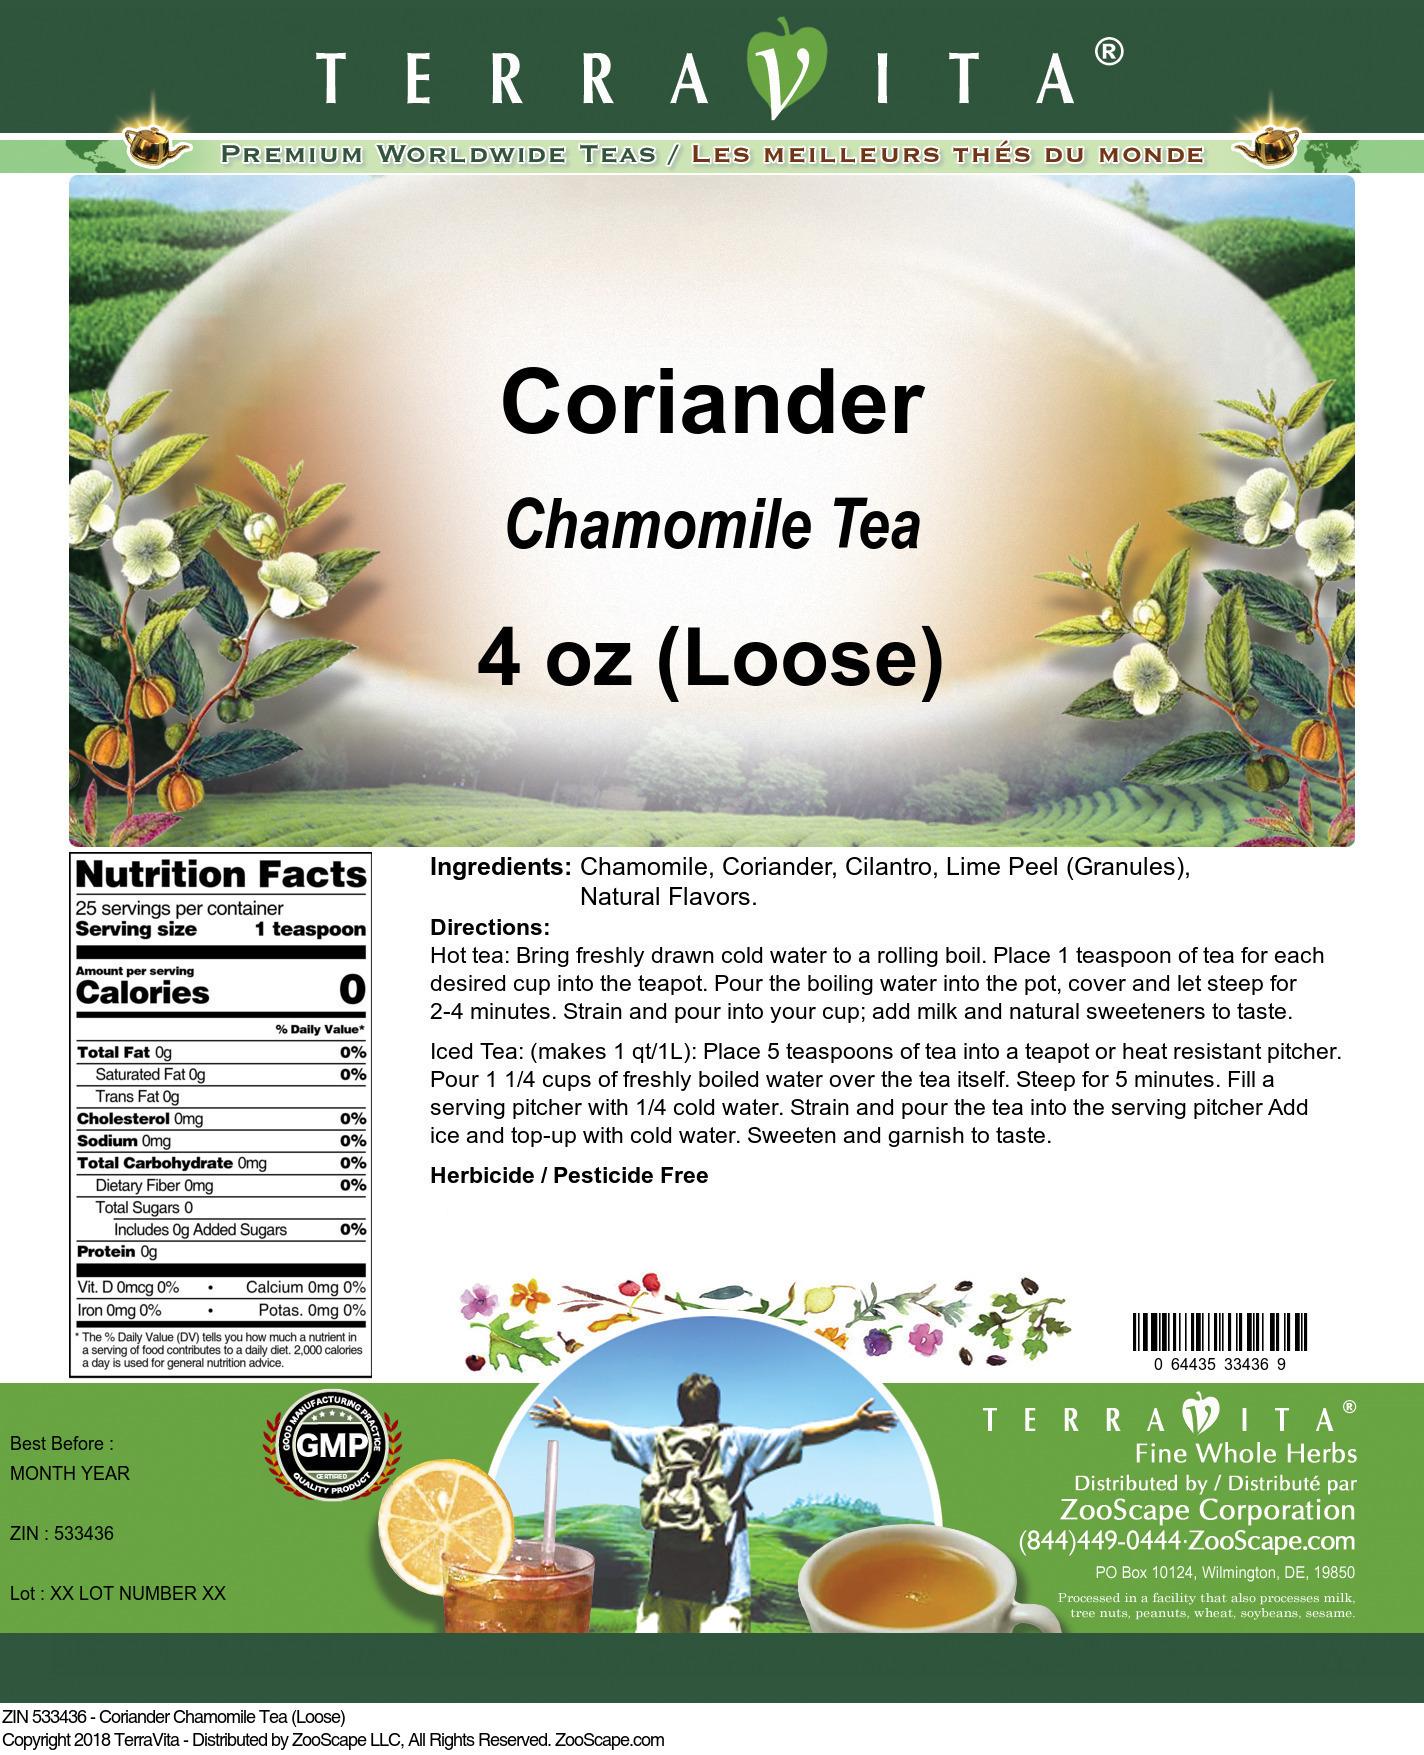 Coriander Chamomile Tea (Loose)